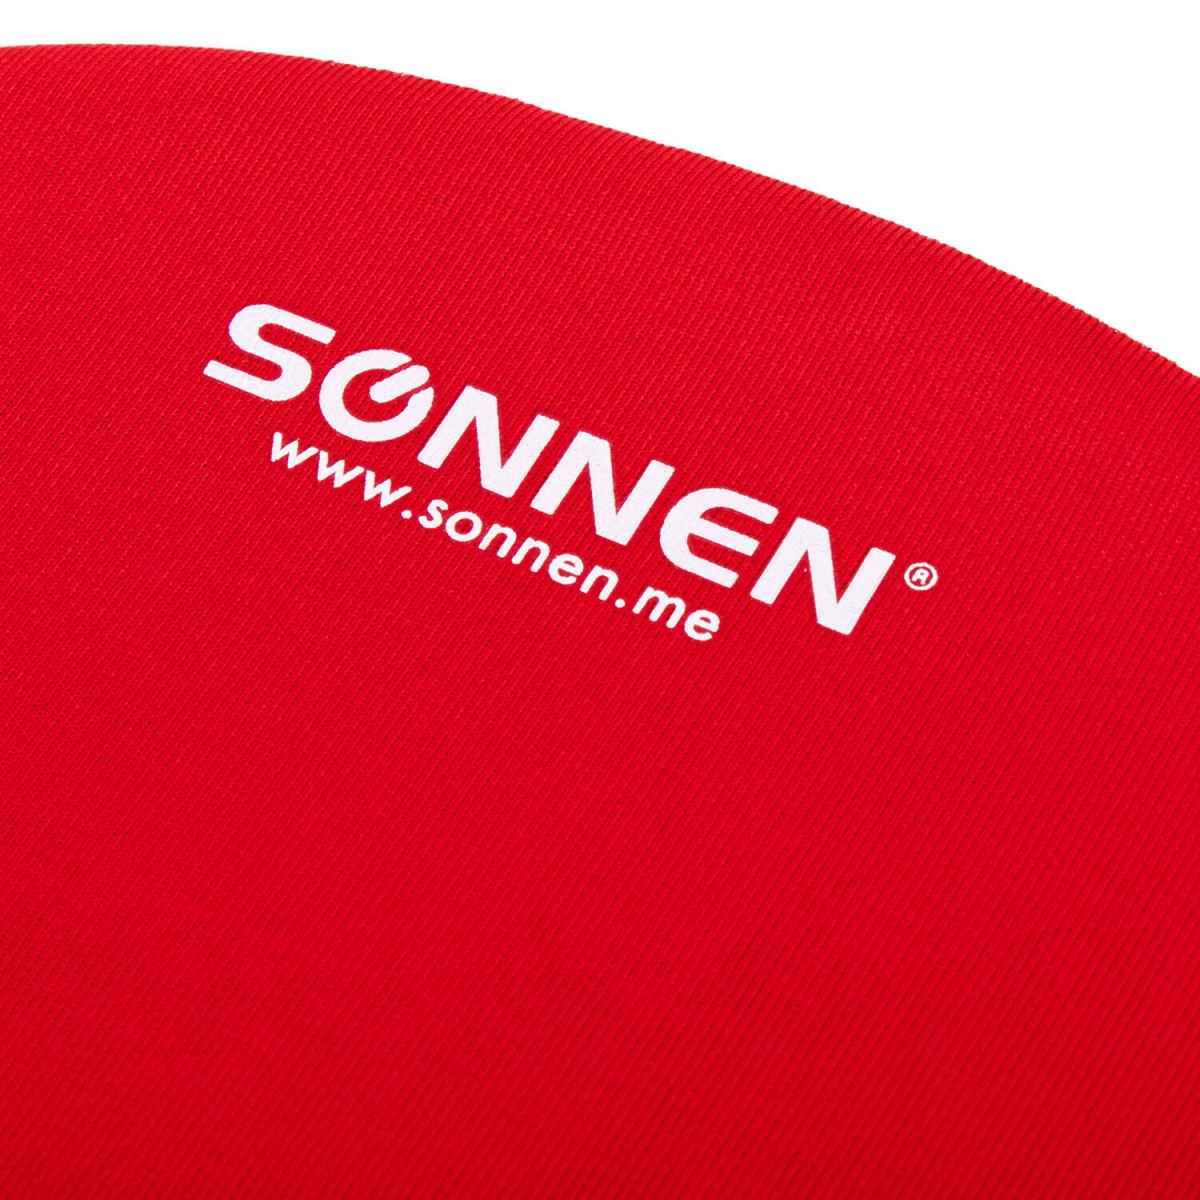 Коврик для мыши с подушкой под запястье SONNEN, полиуретан + лайкра, 250х220х20 мм, красный, 513301 (арт. 513301)